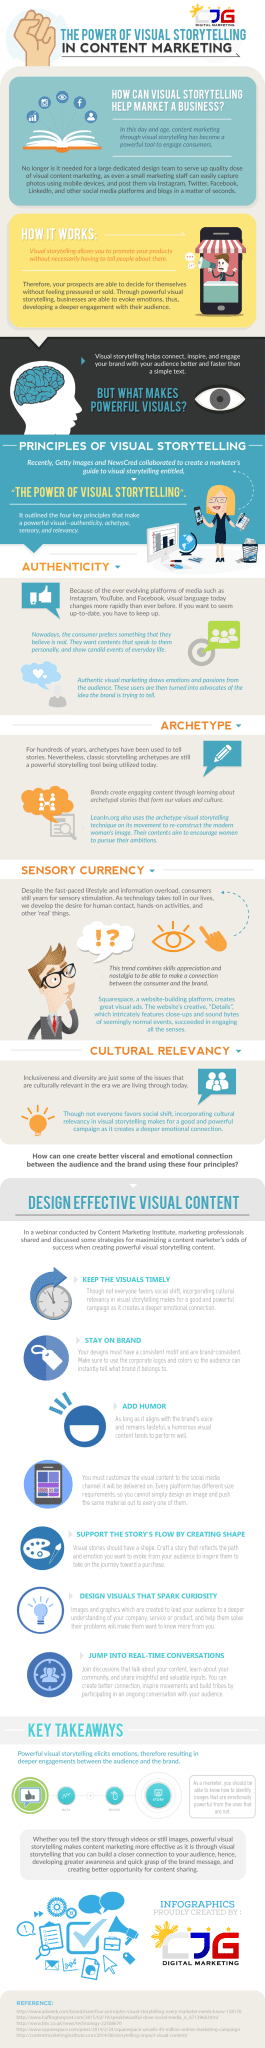 The Power of Visual Storytelling in Content Marketing - CJG Digital Marketing